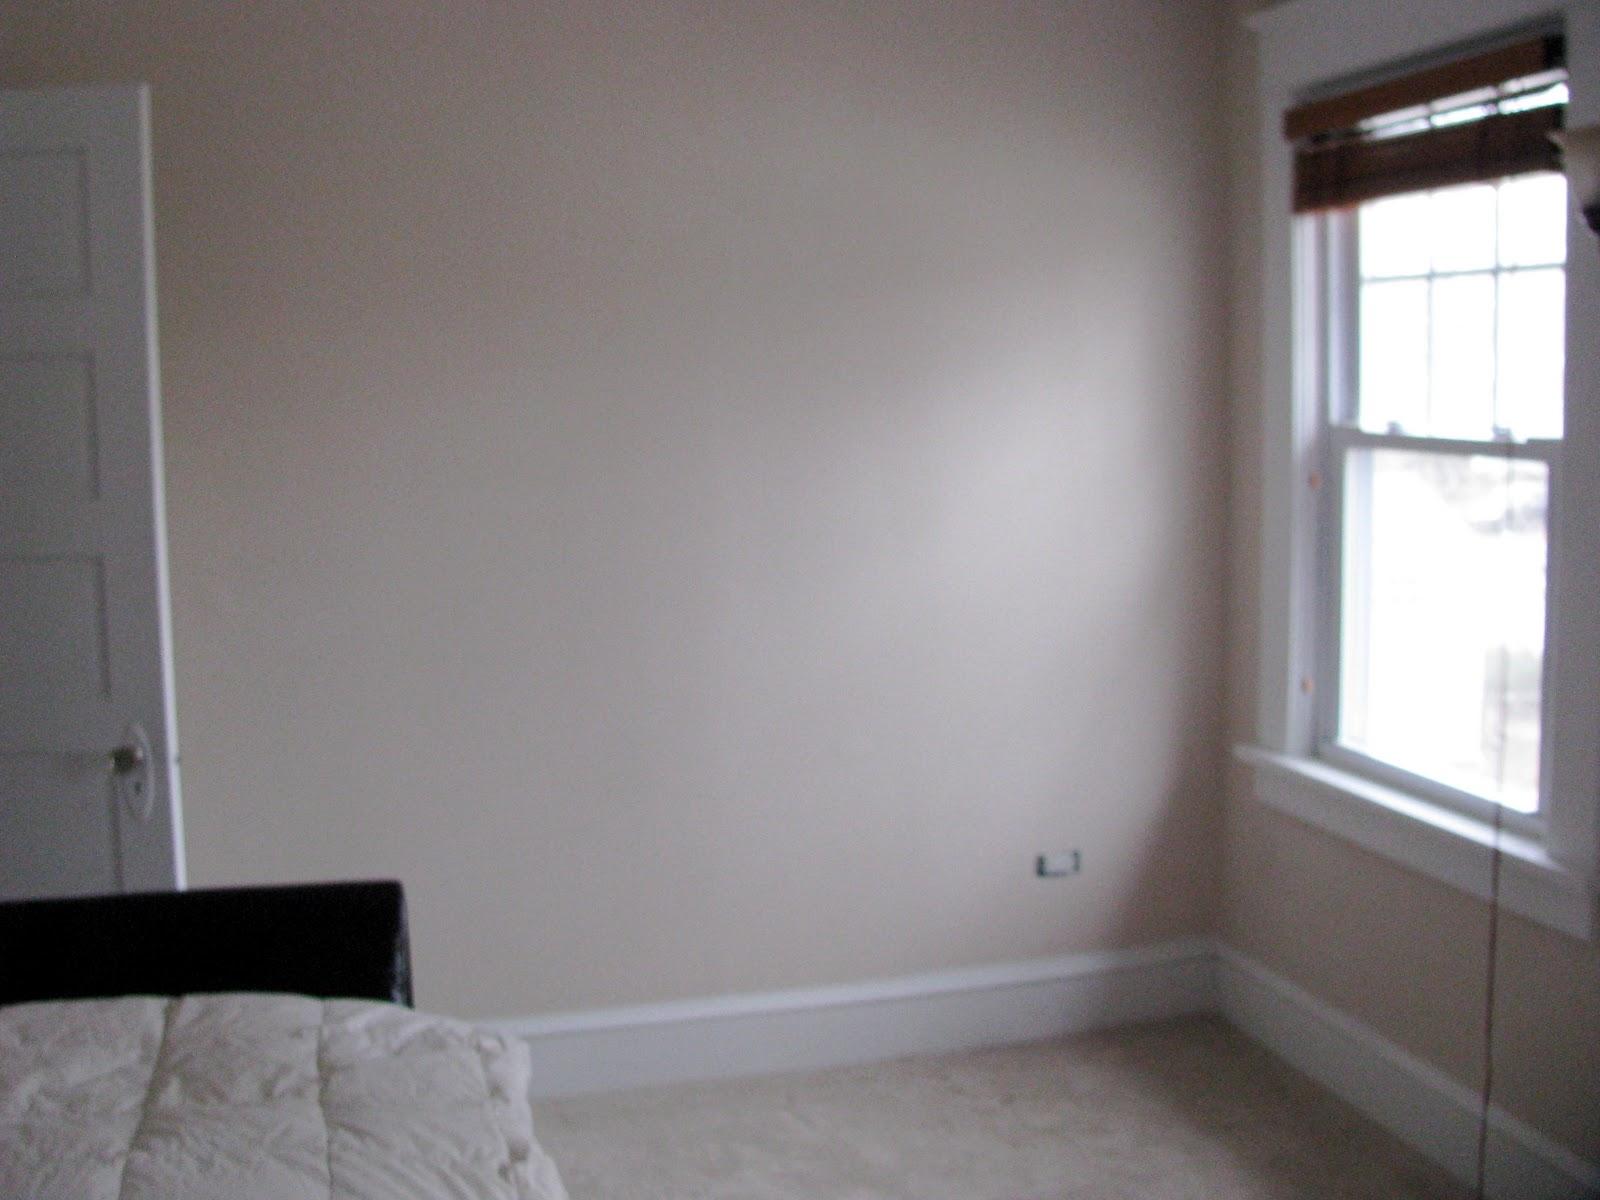 bed room sherwin williams wallpaper border 1600x1200